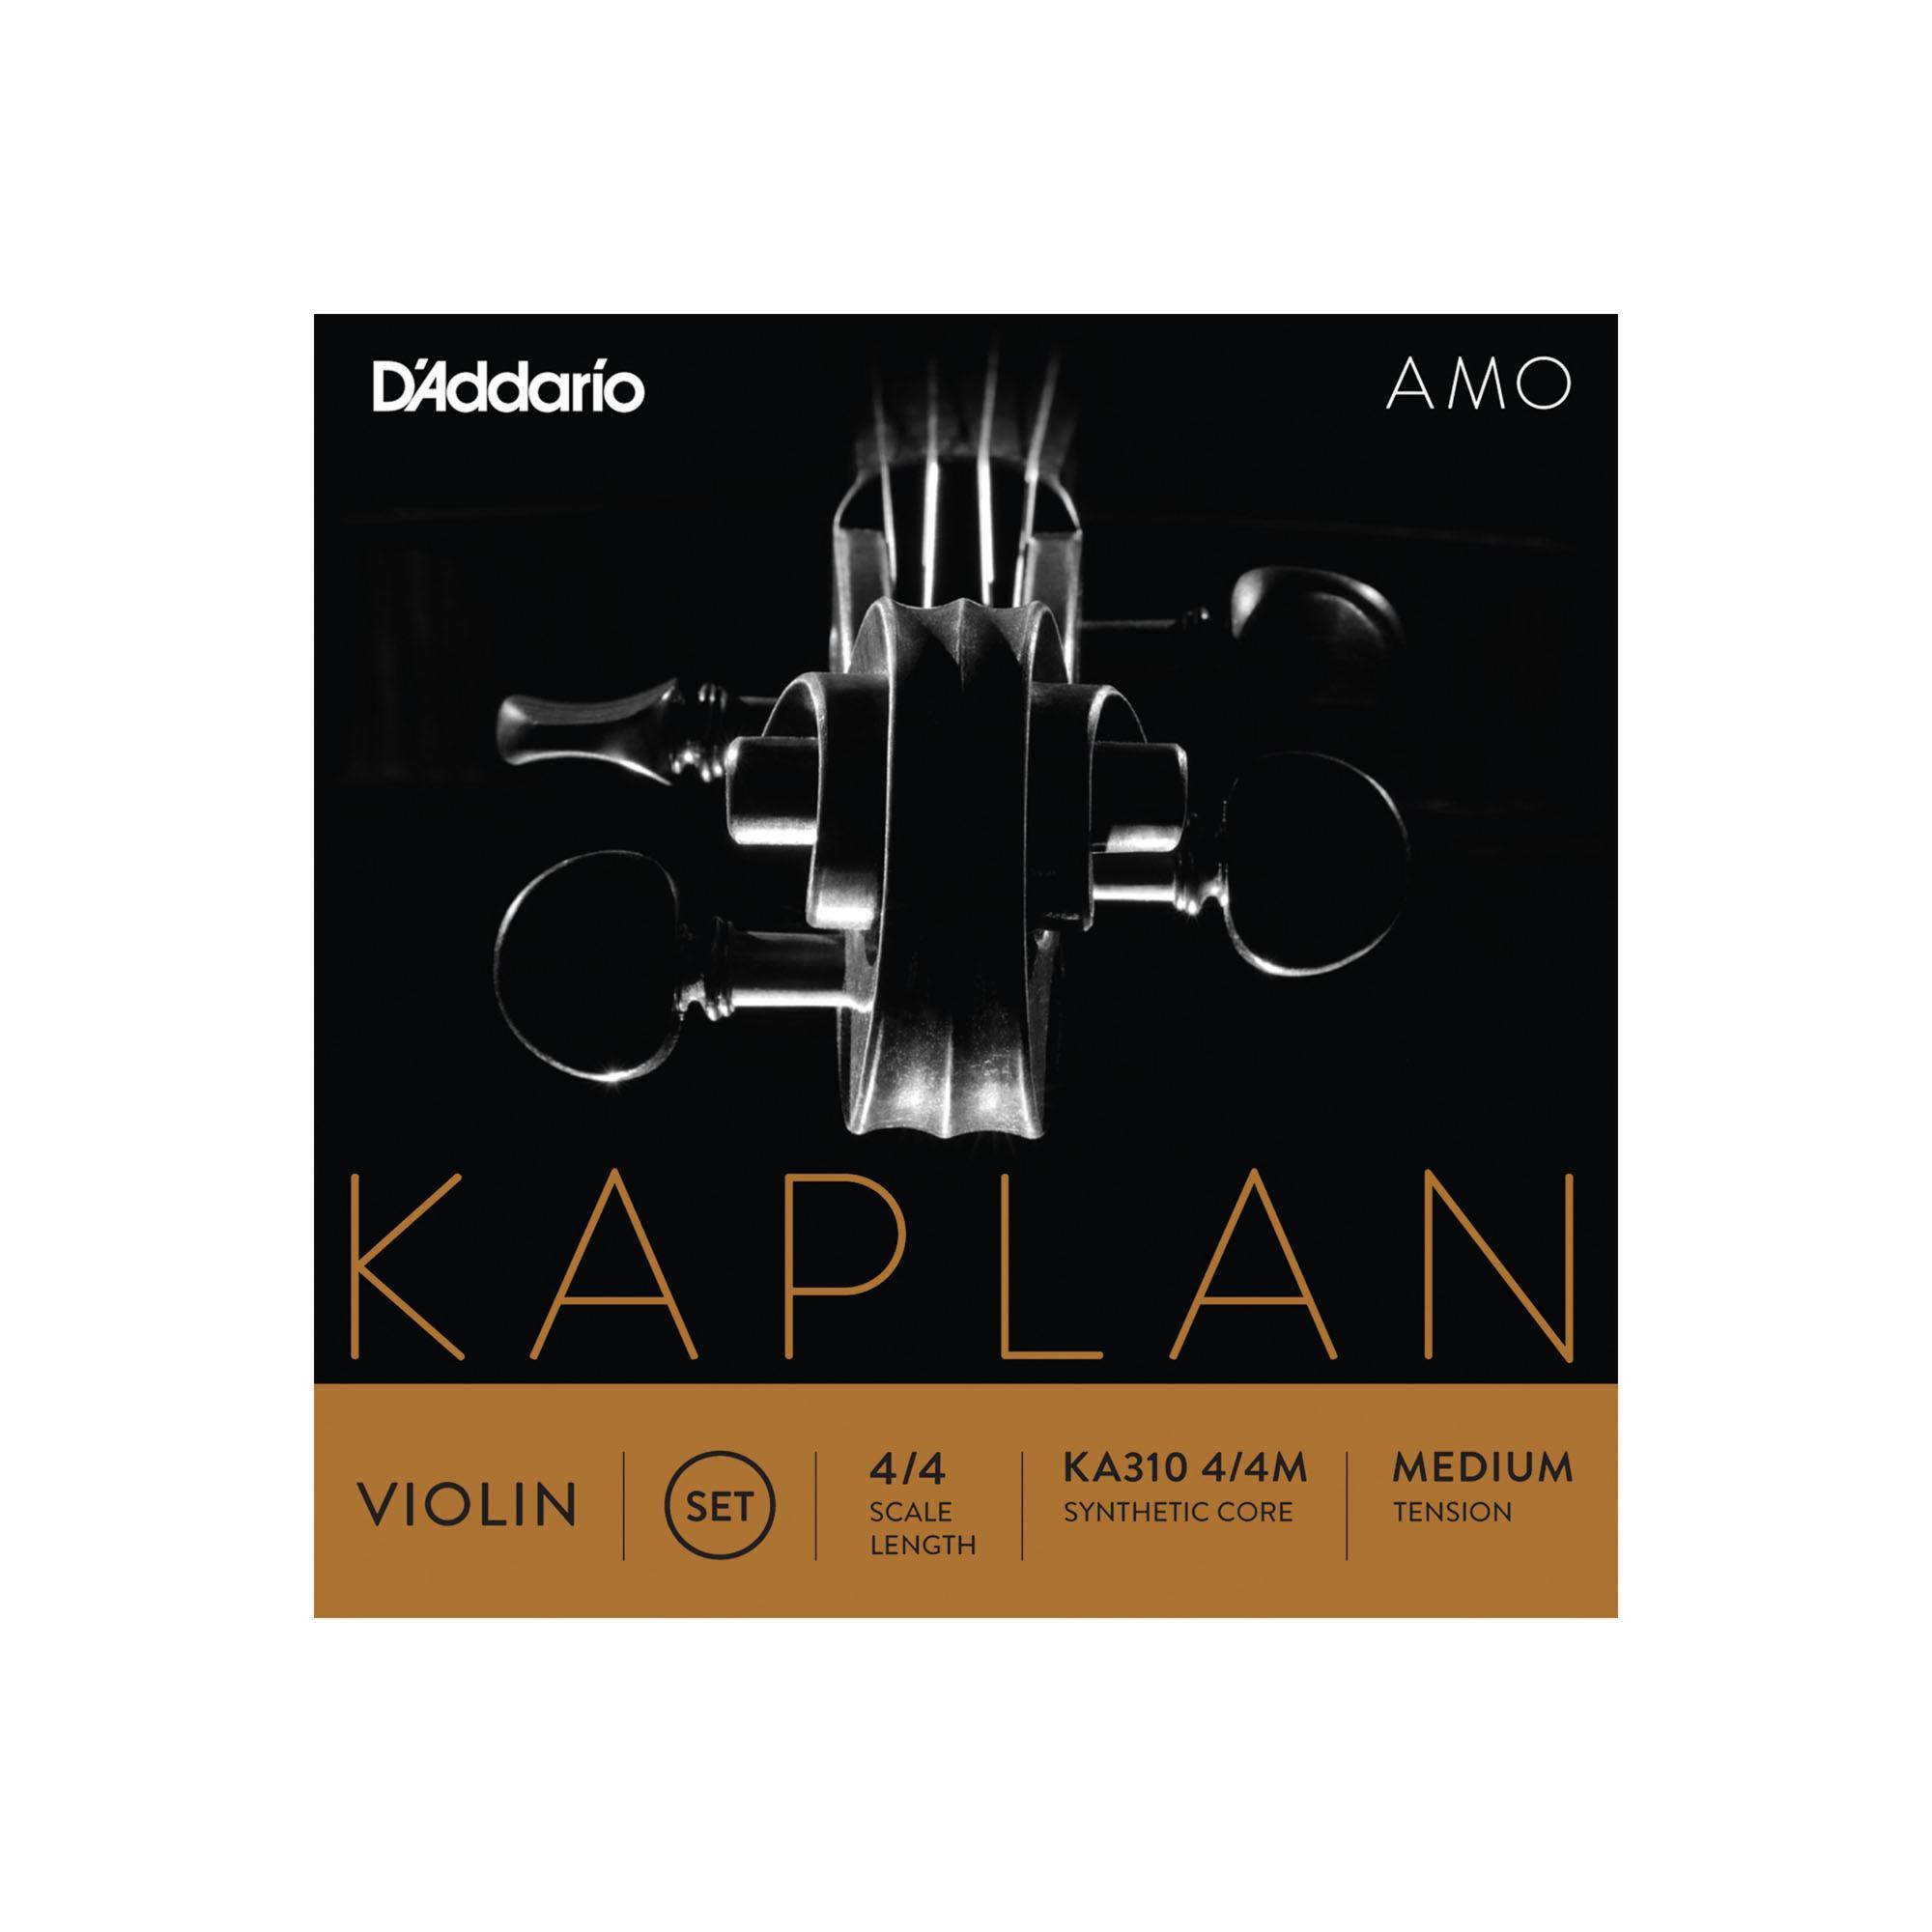 D'Addario Kaplan Amo Violin Strings